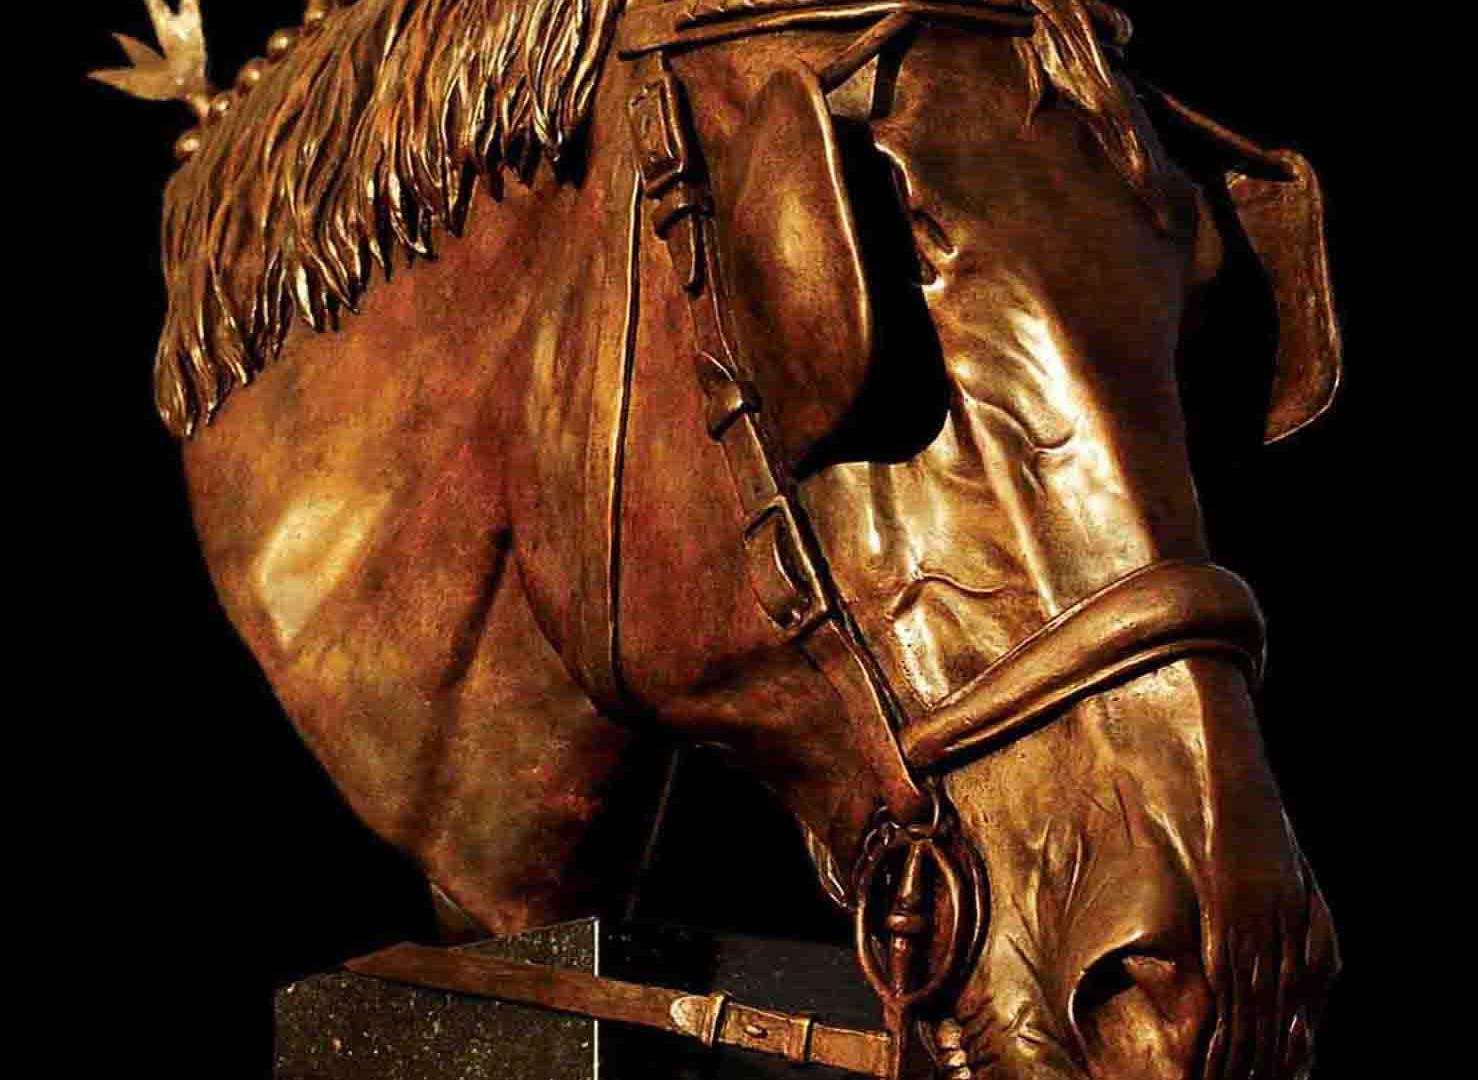 Shire horse bronze sculpture